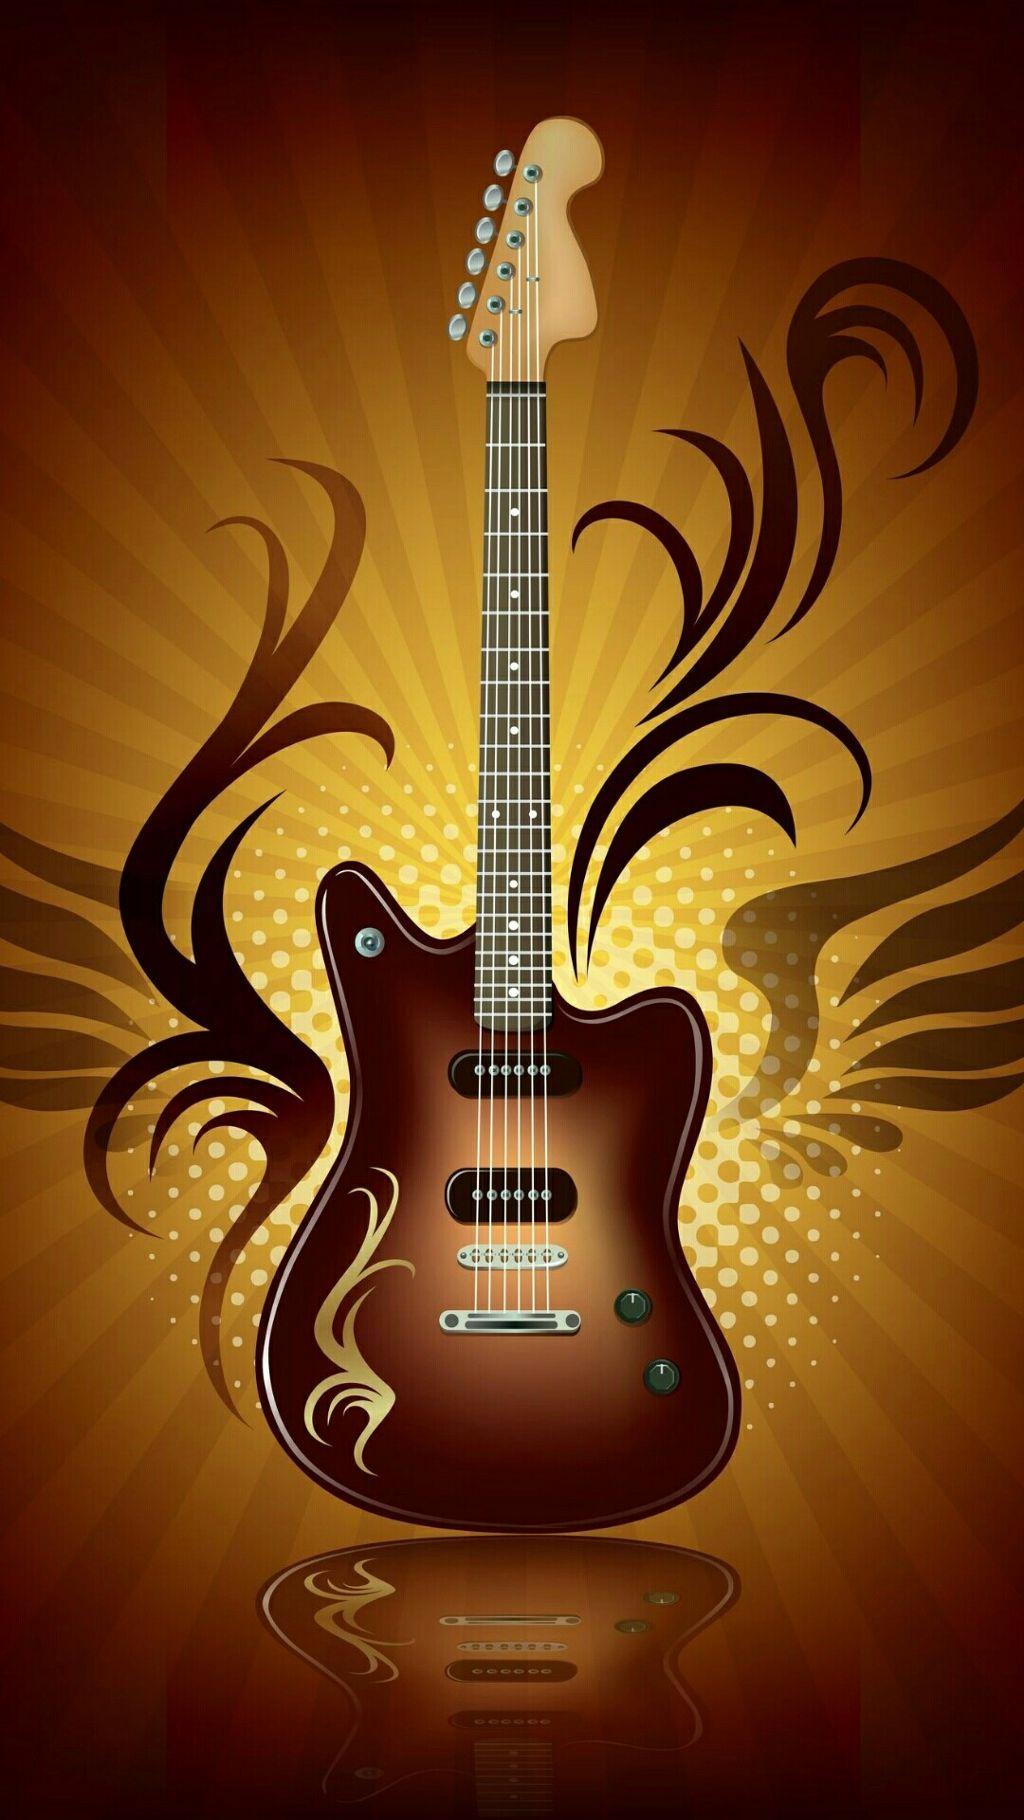 freetoedit guitar background wallpaper wallpaperforphon 1024x1820